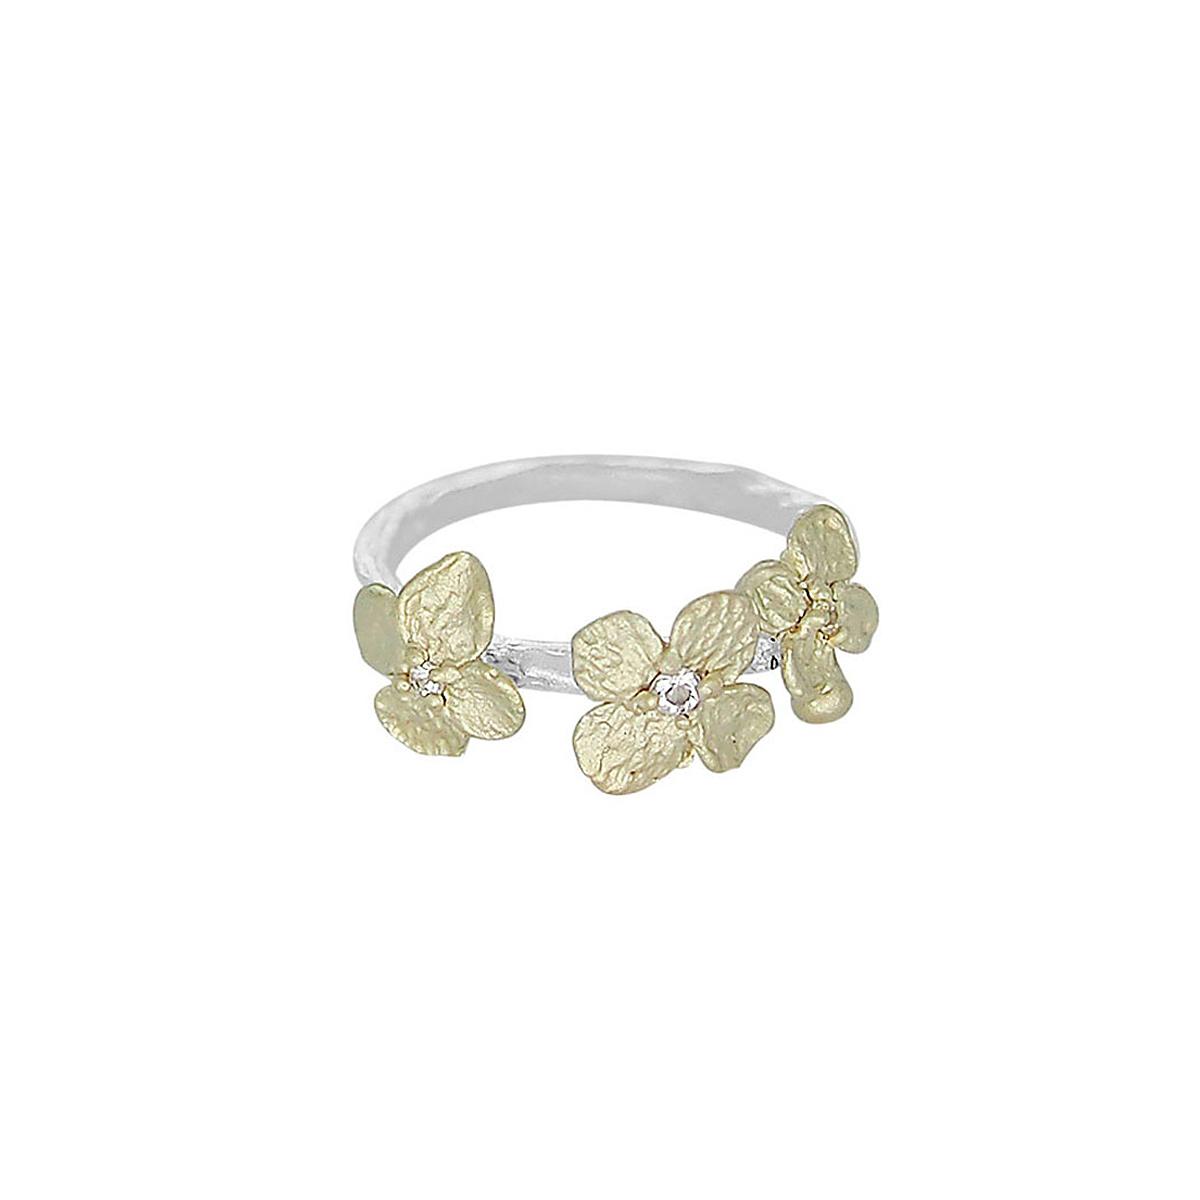 r3340-lotta-jewellery-ring